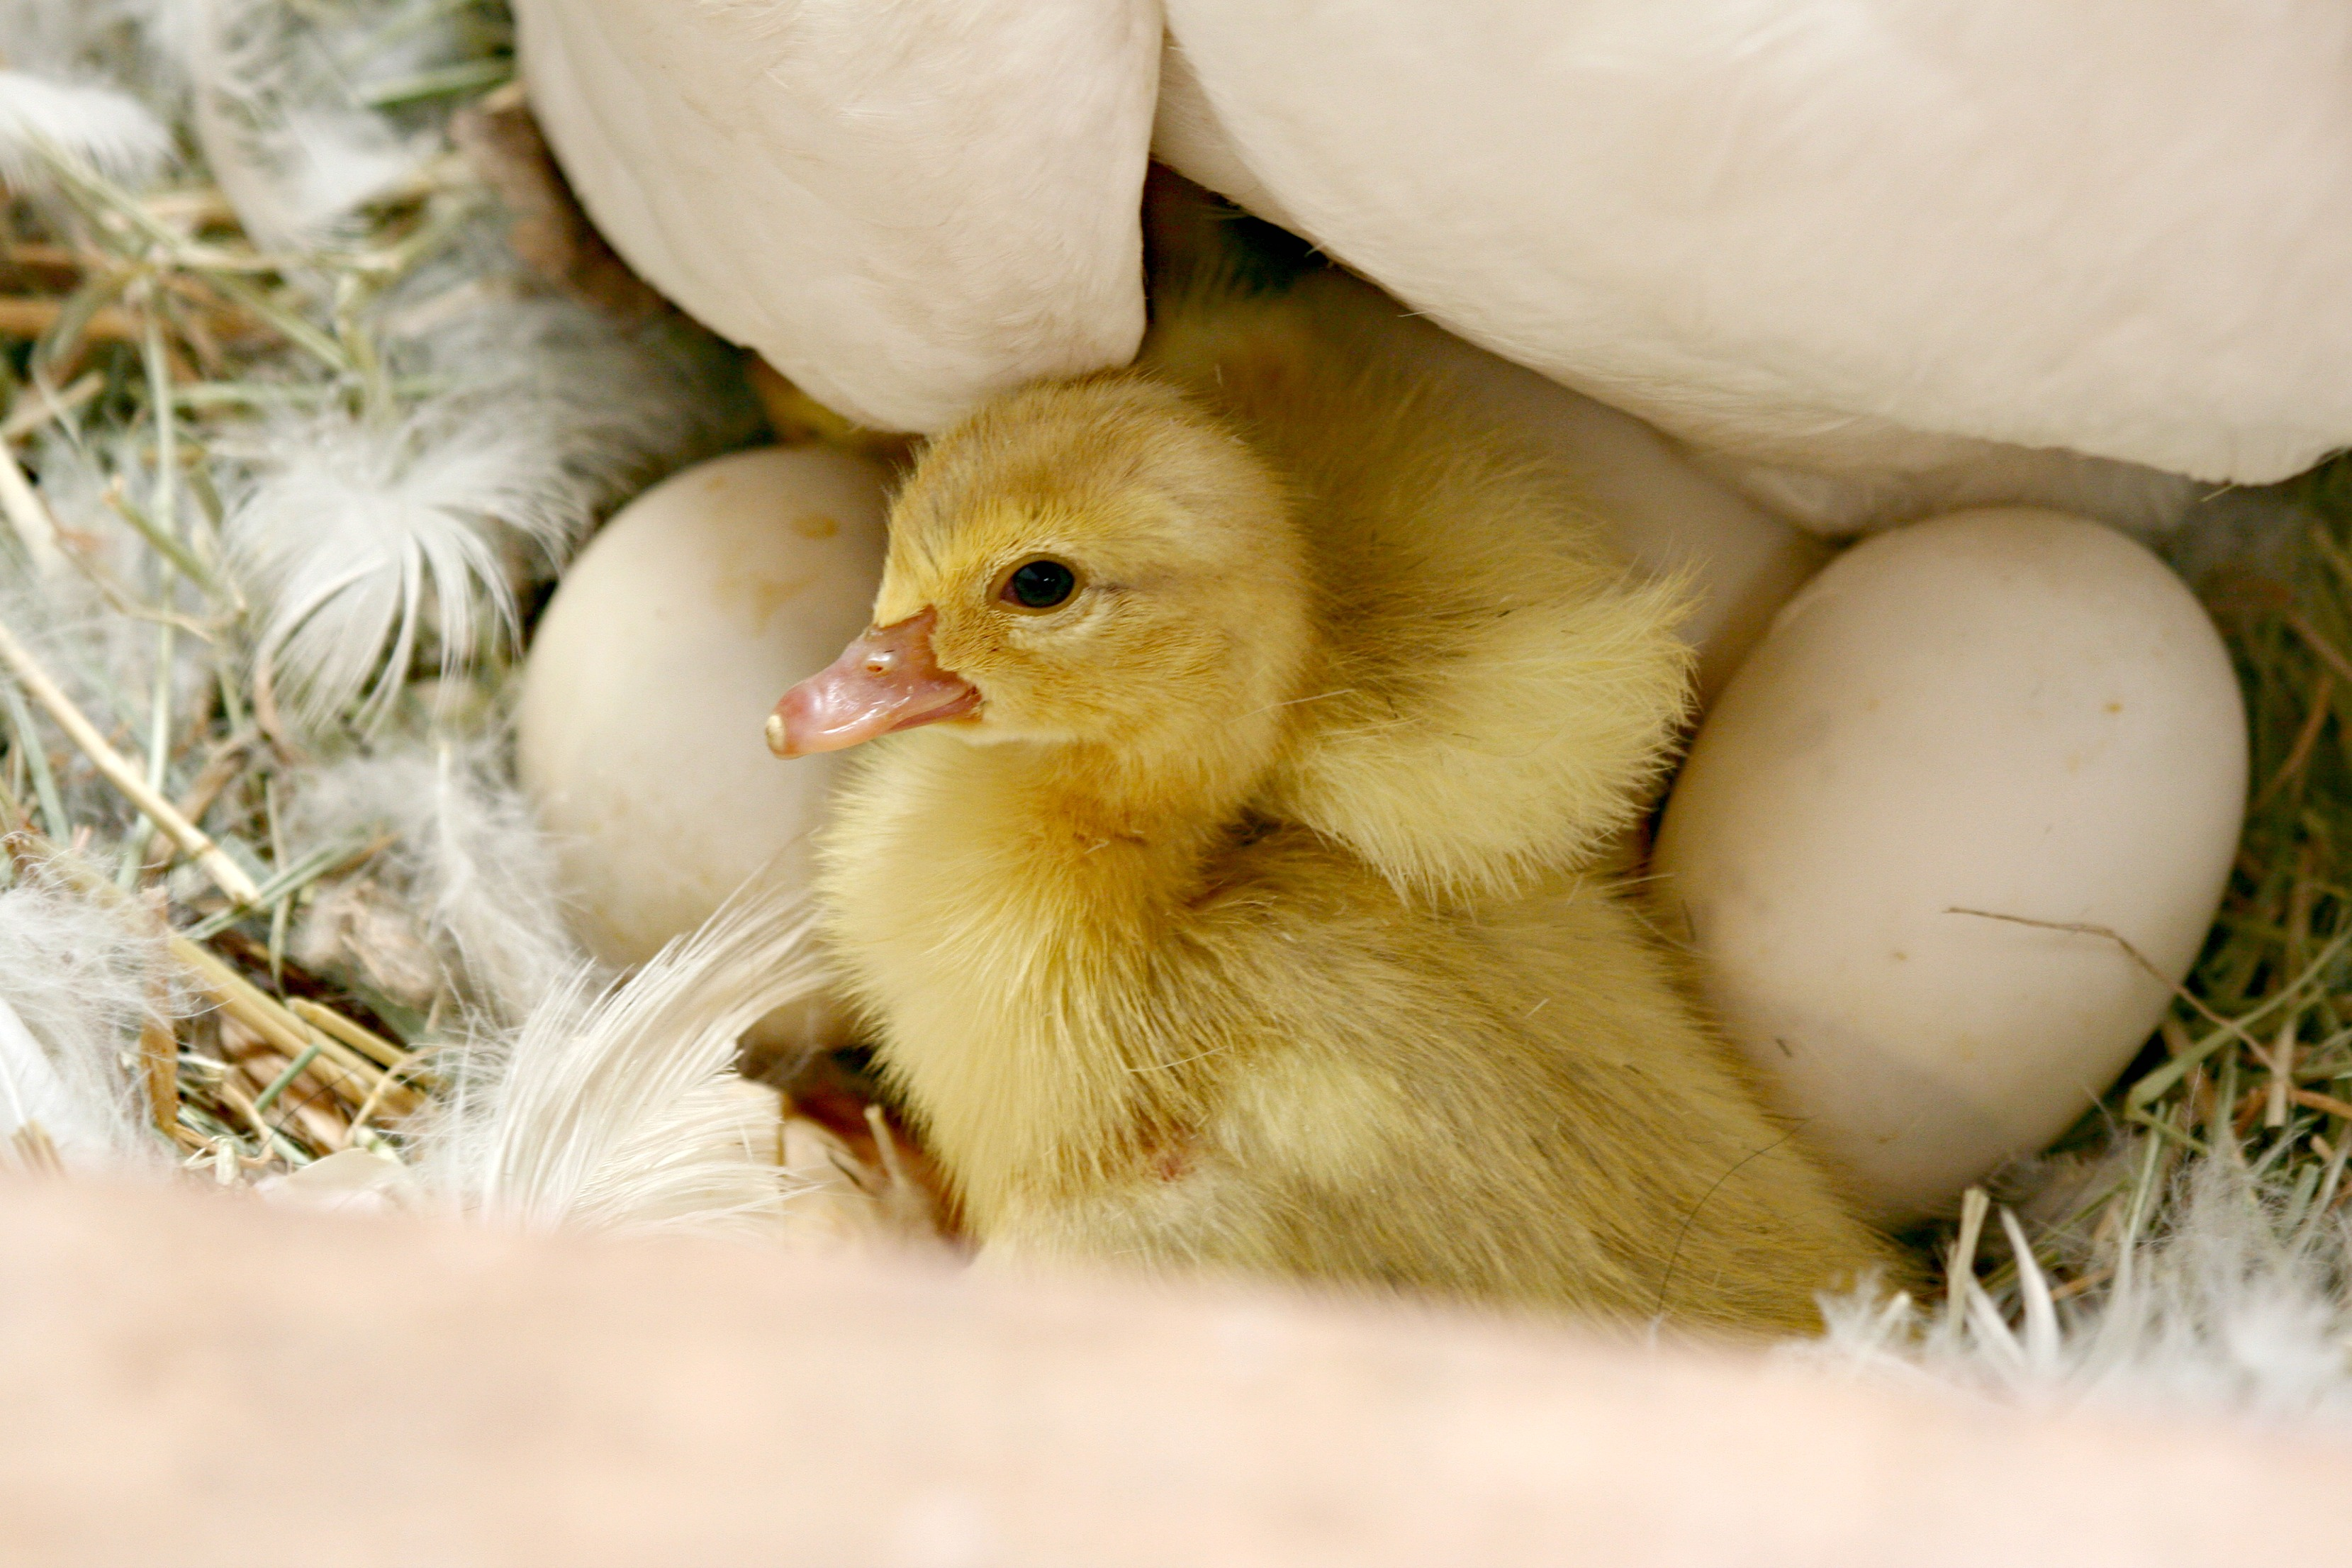 Cute Duck Hd Wallpaper Baby Ducks Morning Bray Farm